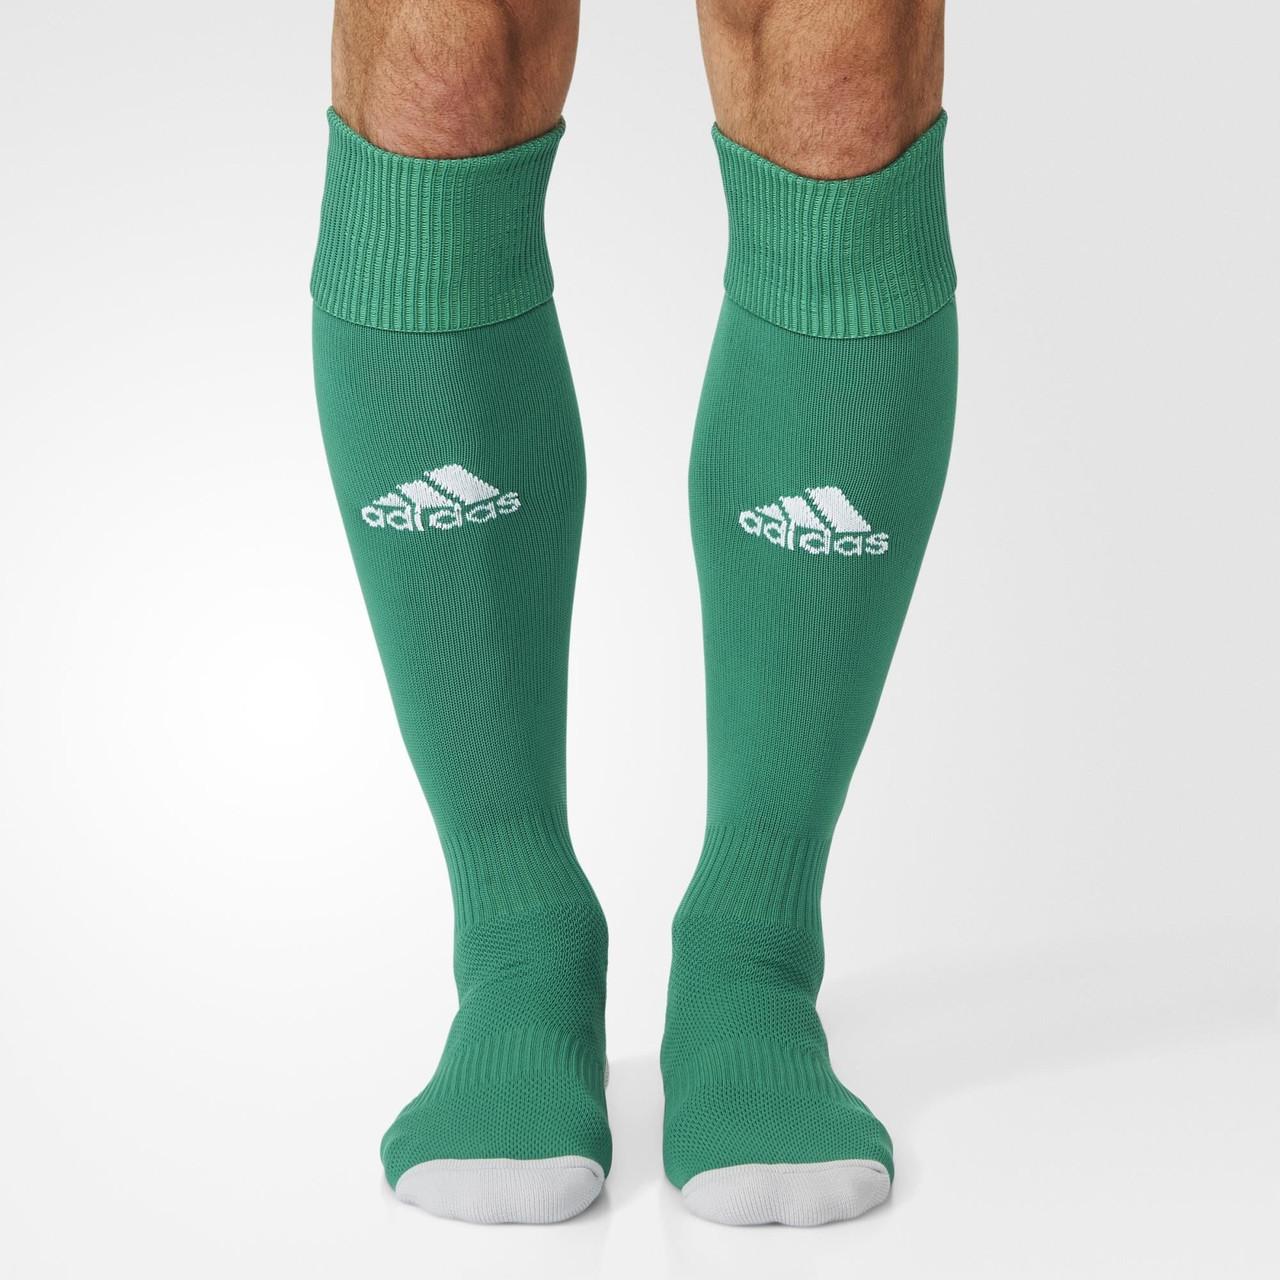 Футбольные гетры Adidas MILANO 16 (Артикул: AJ5908)